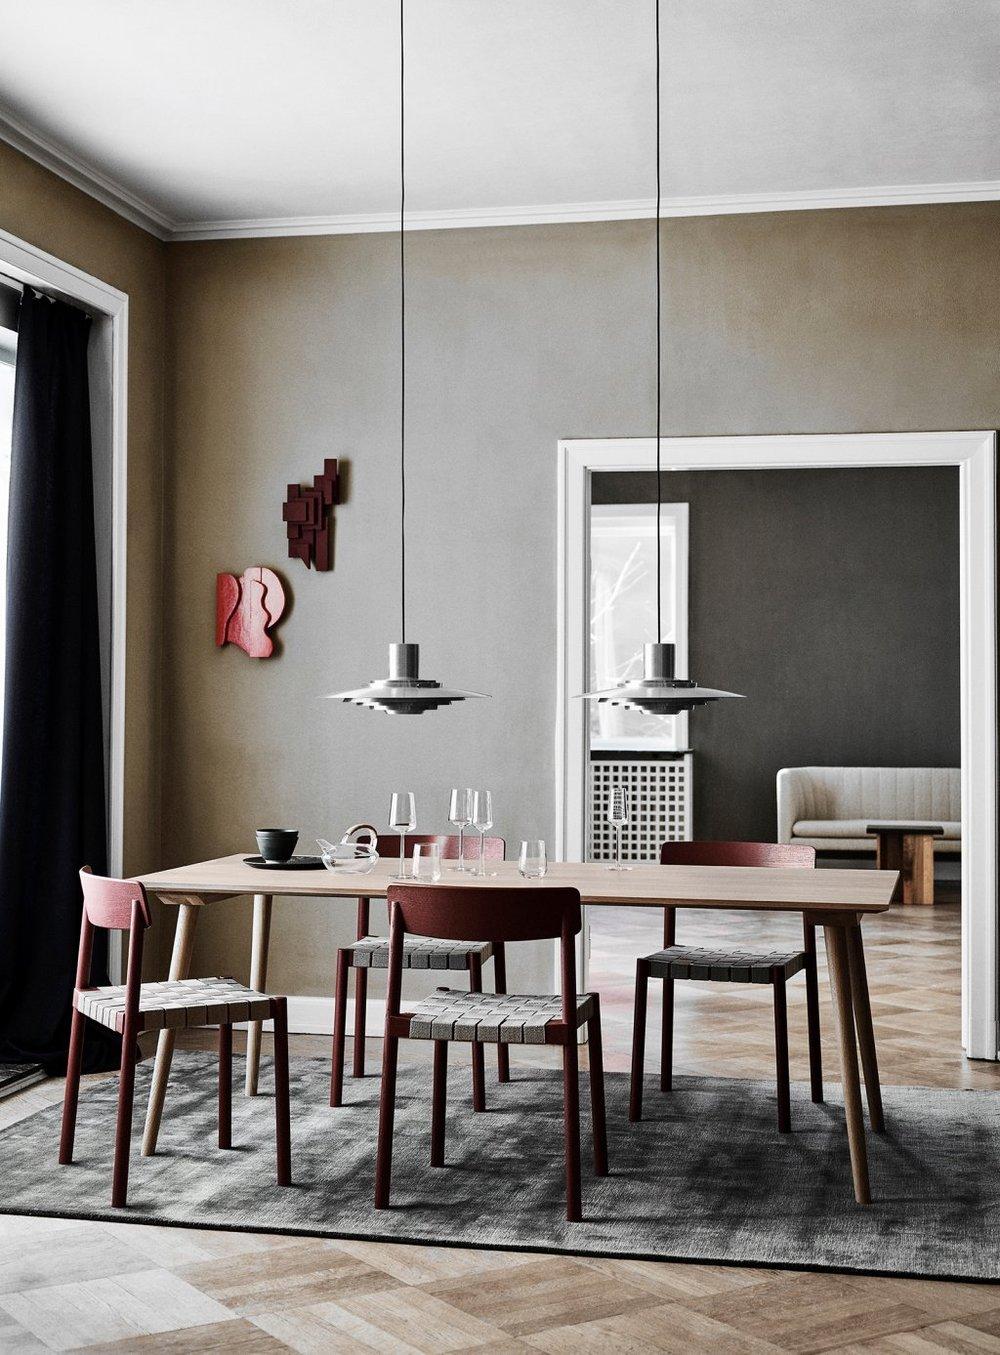 &Tradition's 'Betty' chair by Finnish designer Sami Kallio and Danish designer Jakob Thau.